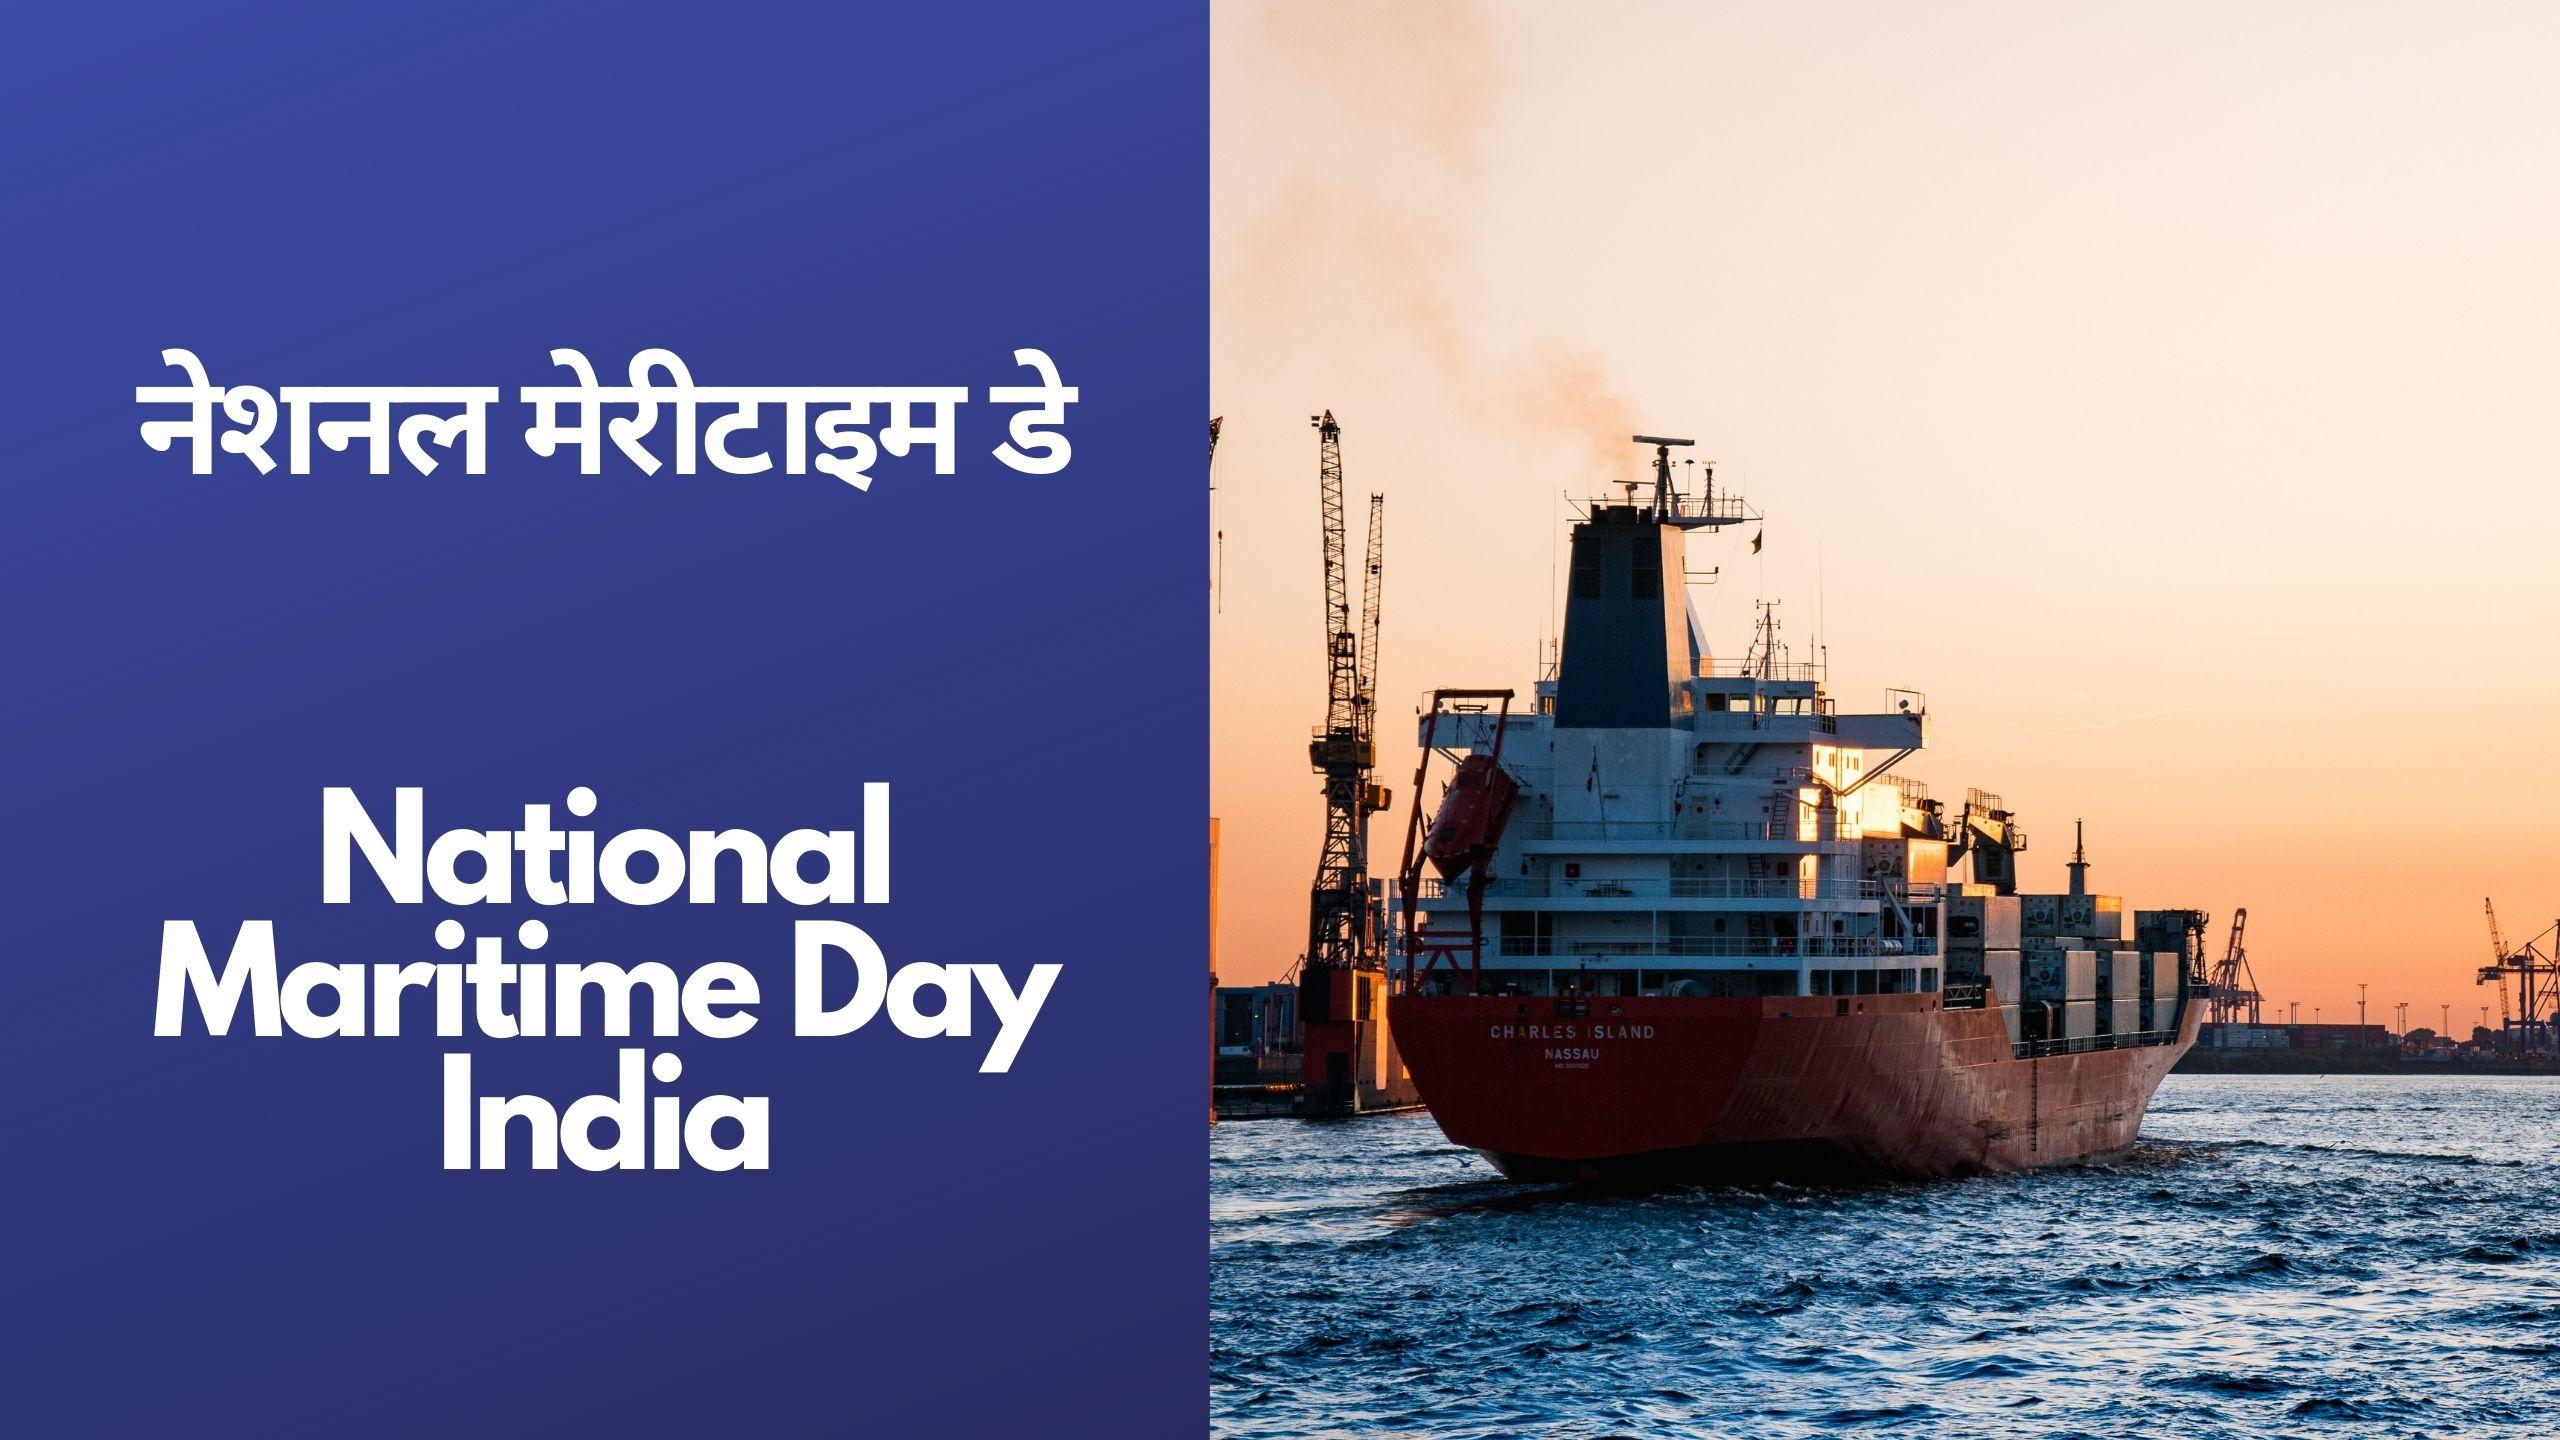 National Maritime Day India